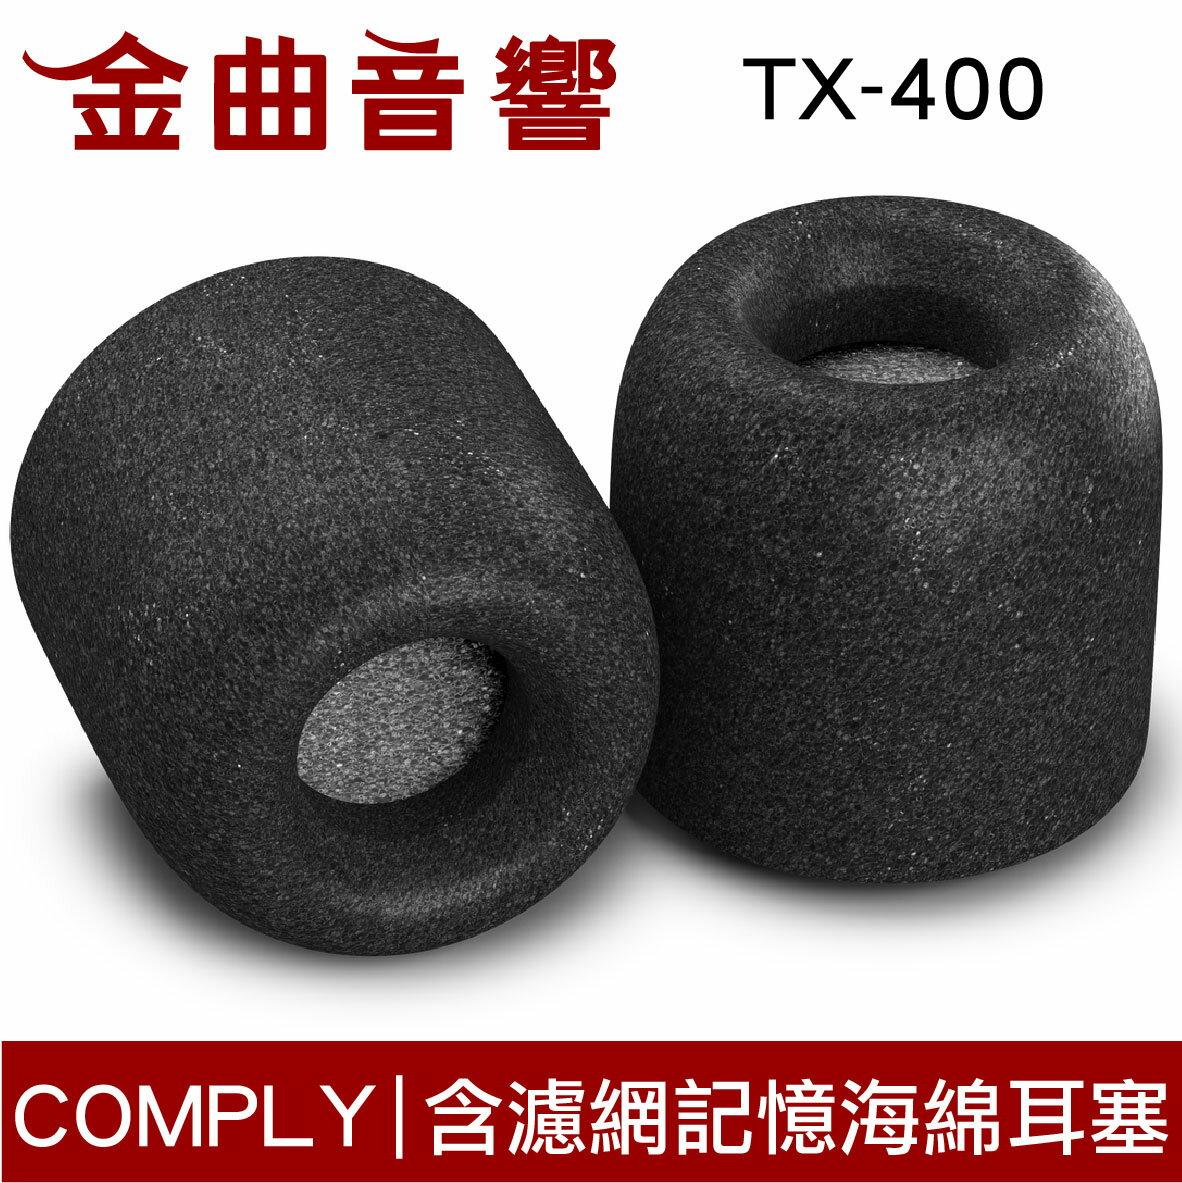 Comply TX-400 海綿耳塞 TX400 Denon C710 JaBra Rox CKR7TW | 金曲音響